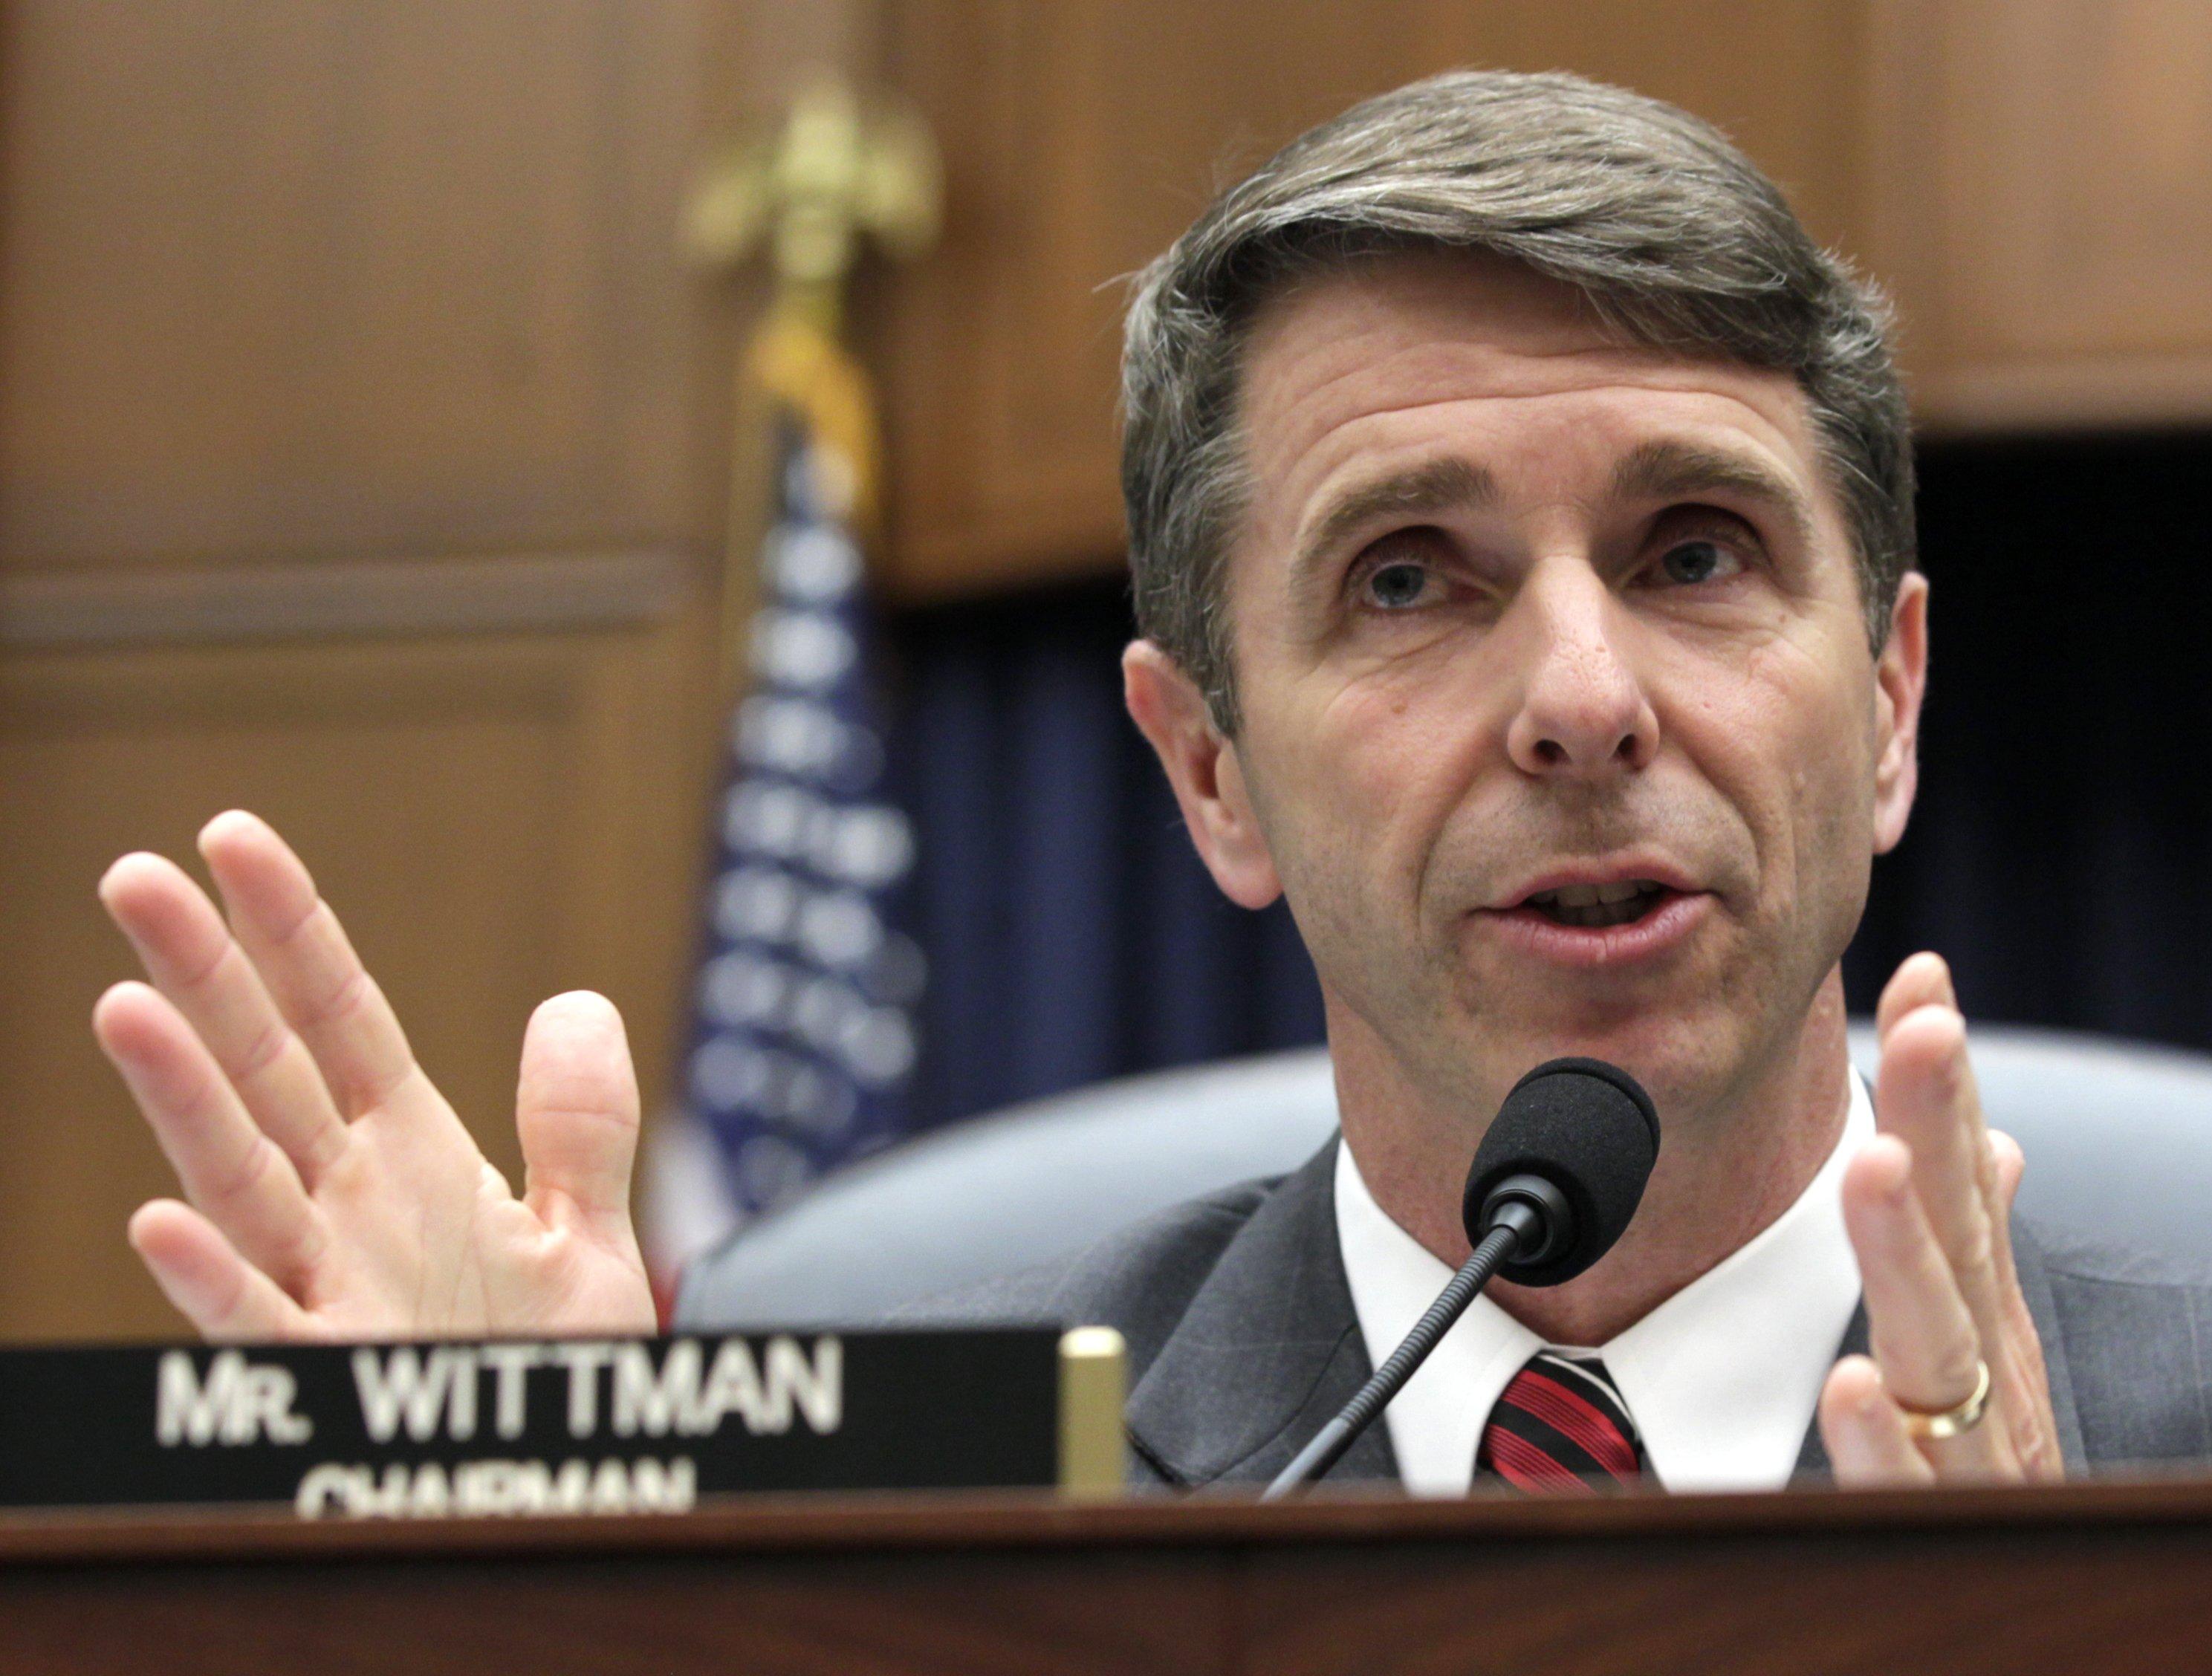 Rep. Rob Wittman (R-Va.)/ AP photo/Carolyn Kaster